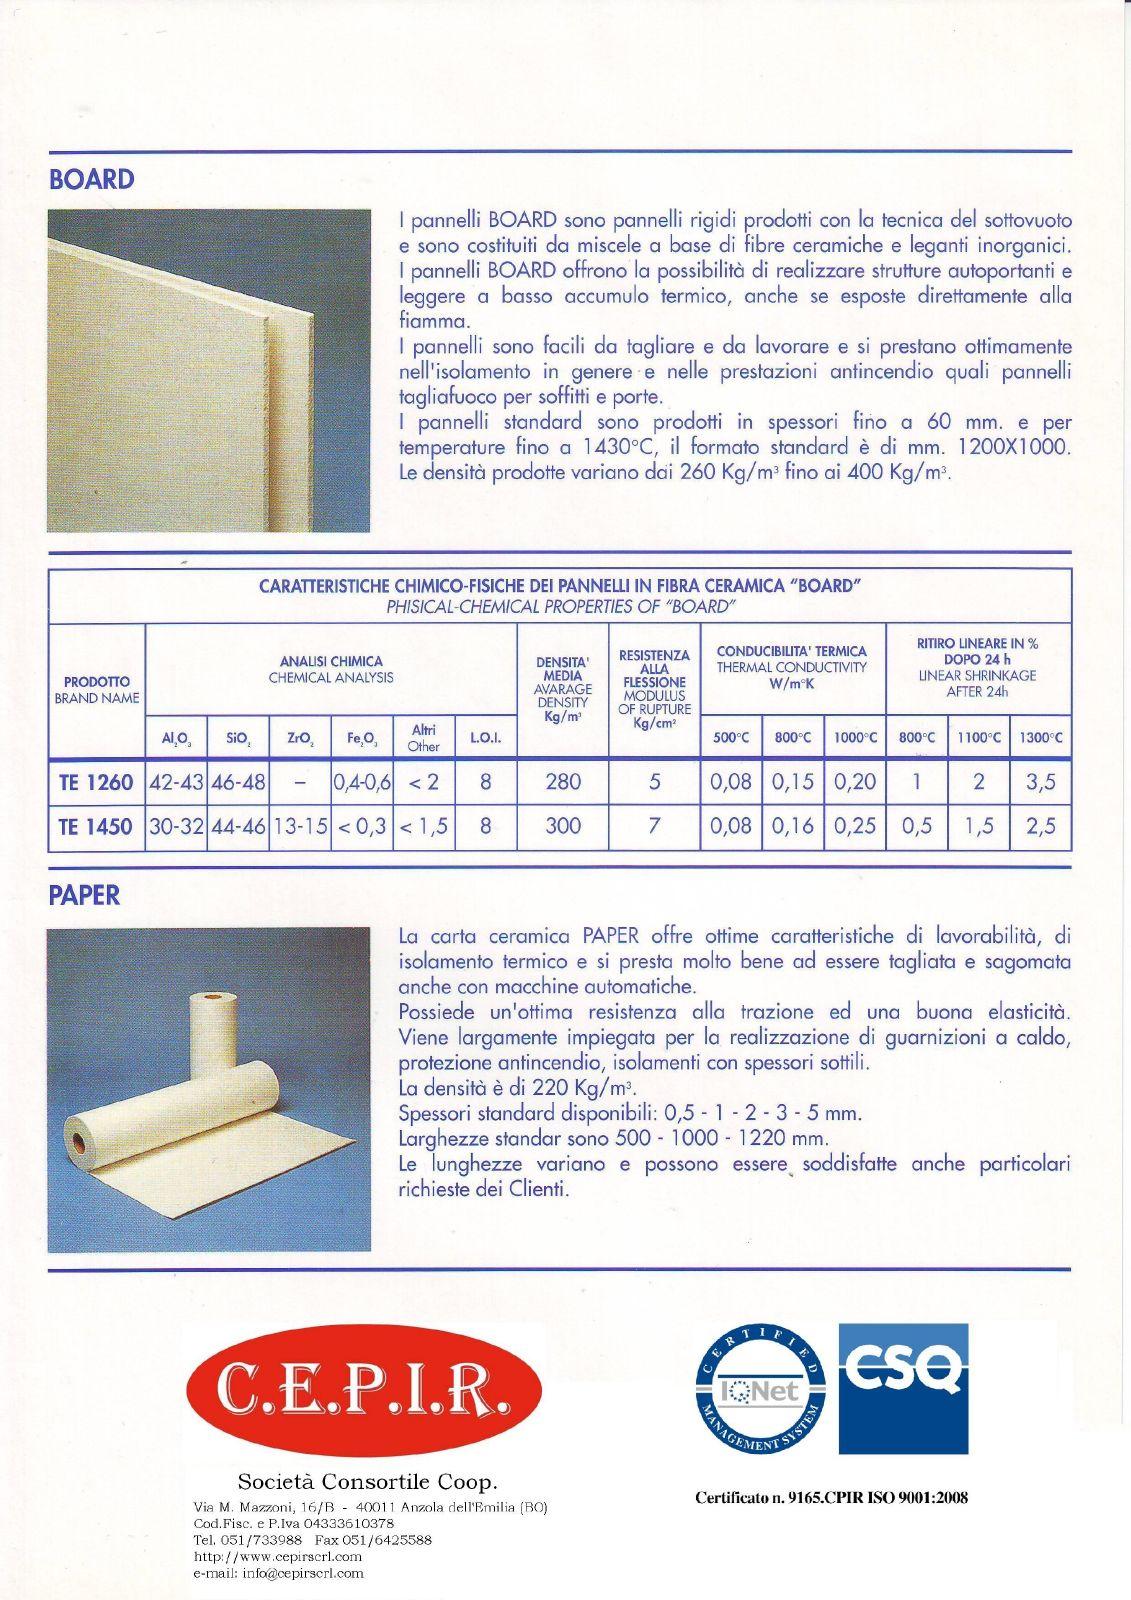 board-paper in F.C.